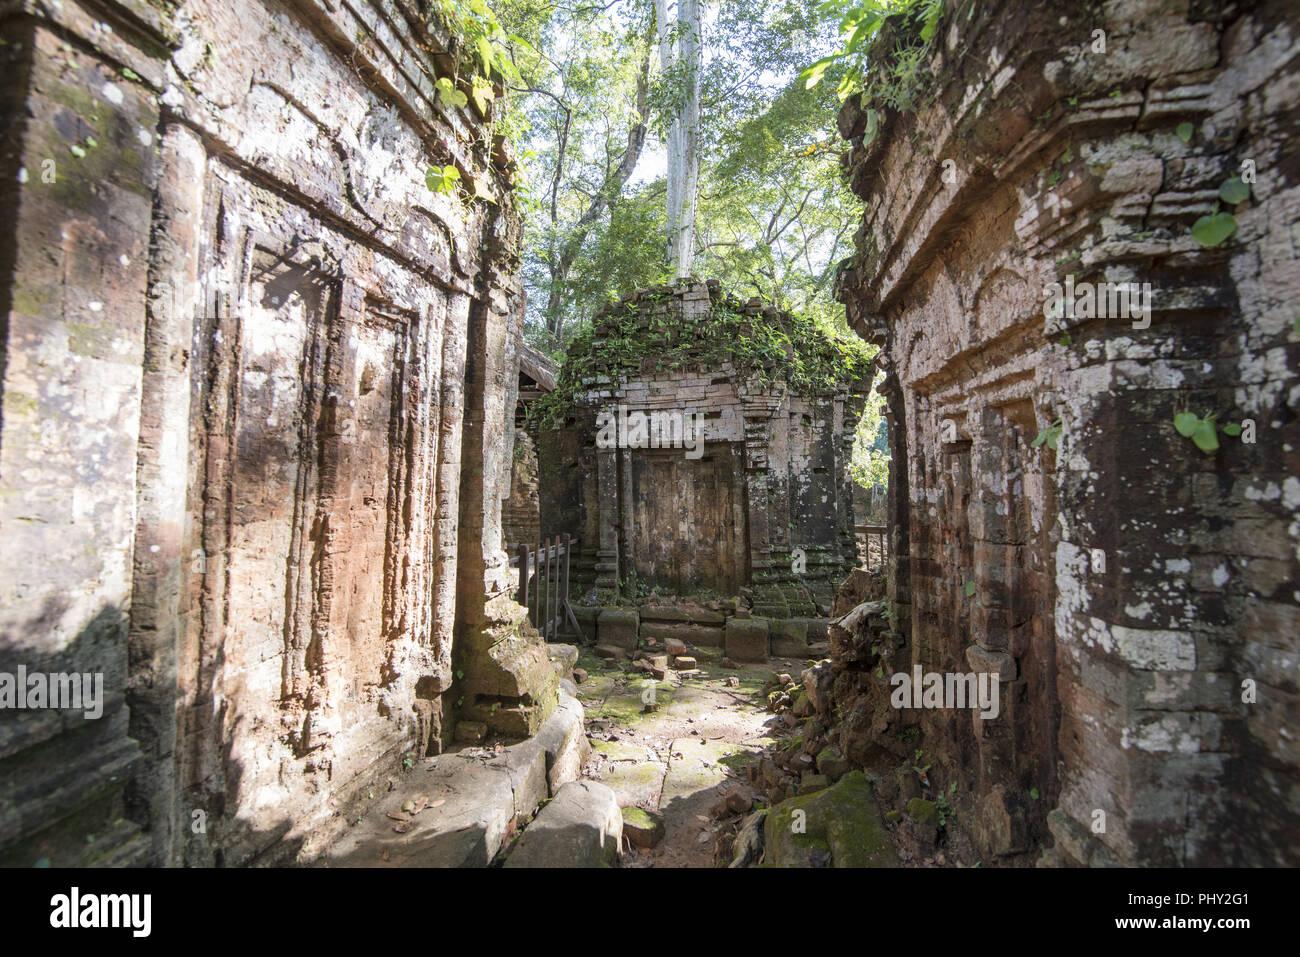 CAMBODIA SRA EM PRASAT KOH KER KHMER TEMPLE - Stock Image